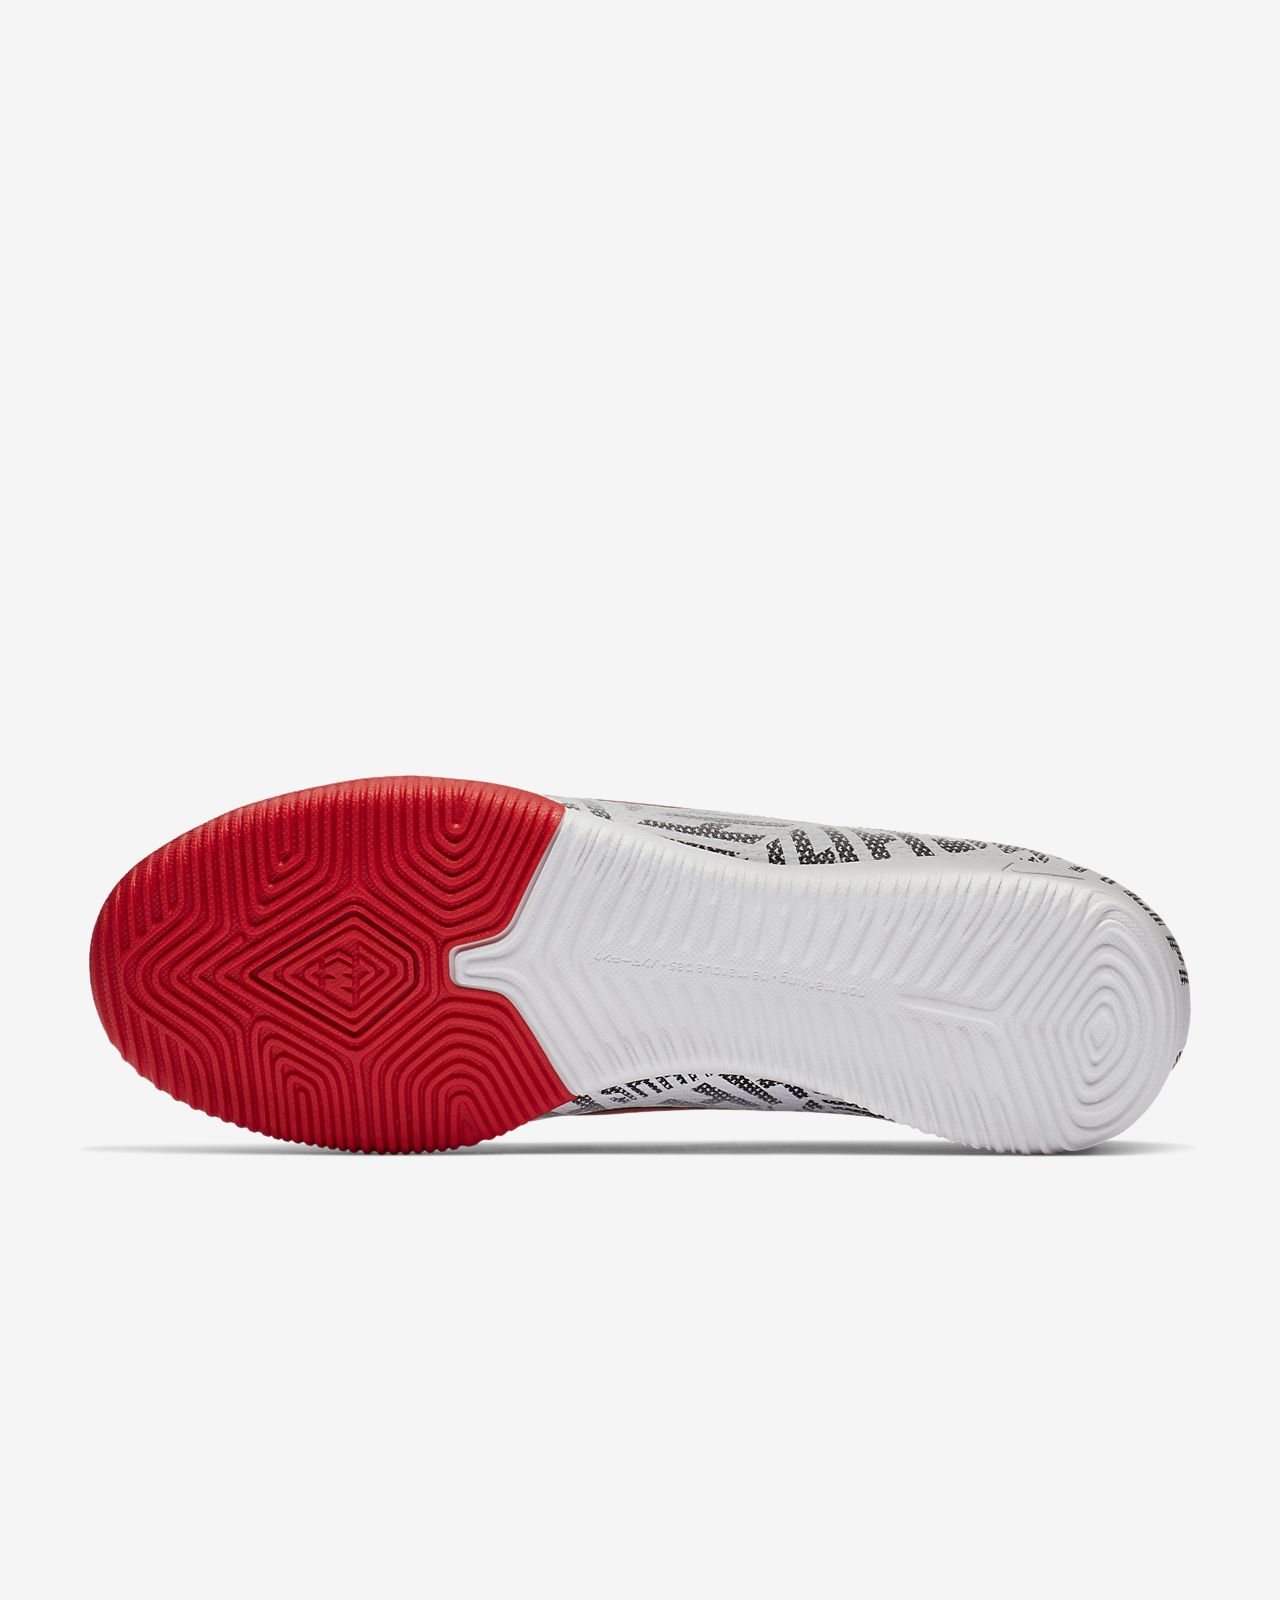 b270a82f160 Nike Mercurial Vapor XII Academy Neymar Jr Indoor Court Soccer Shoe ...